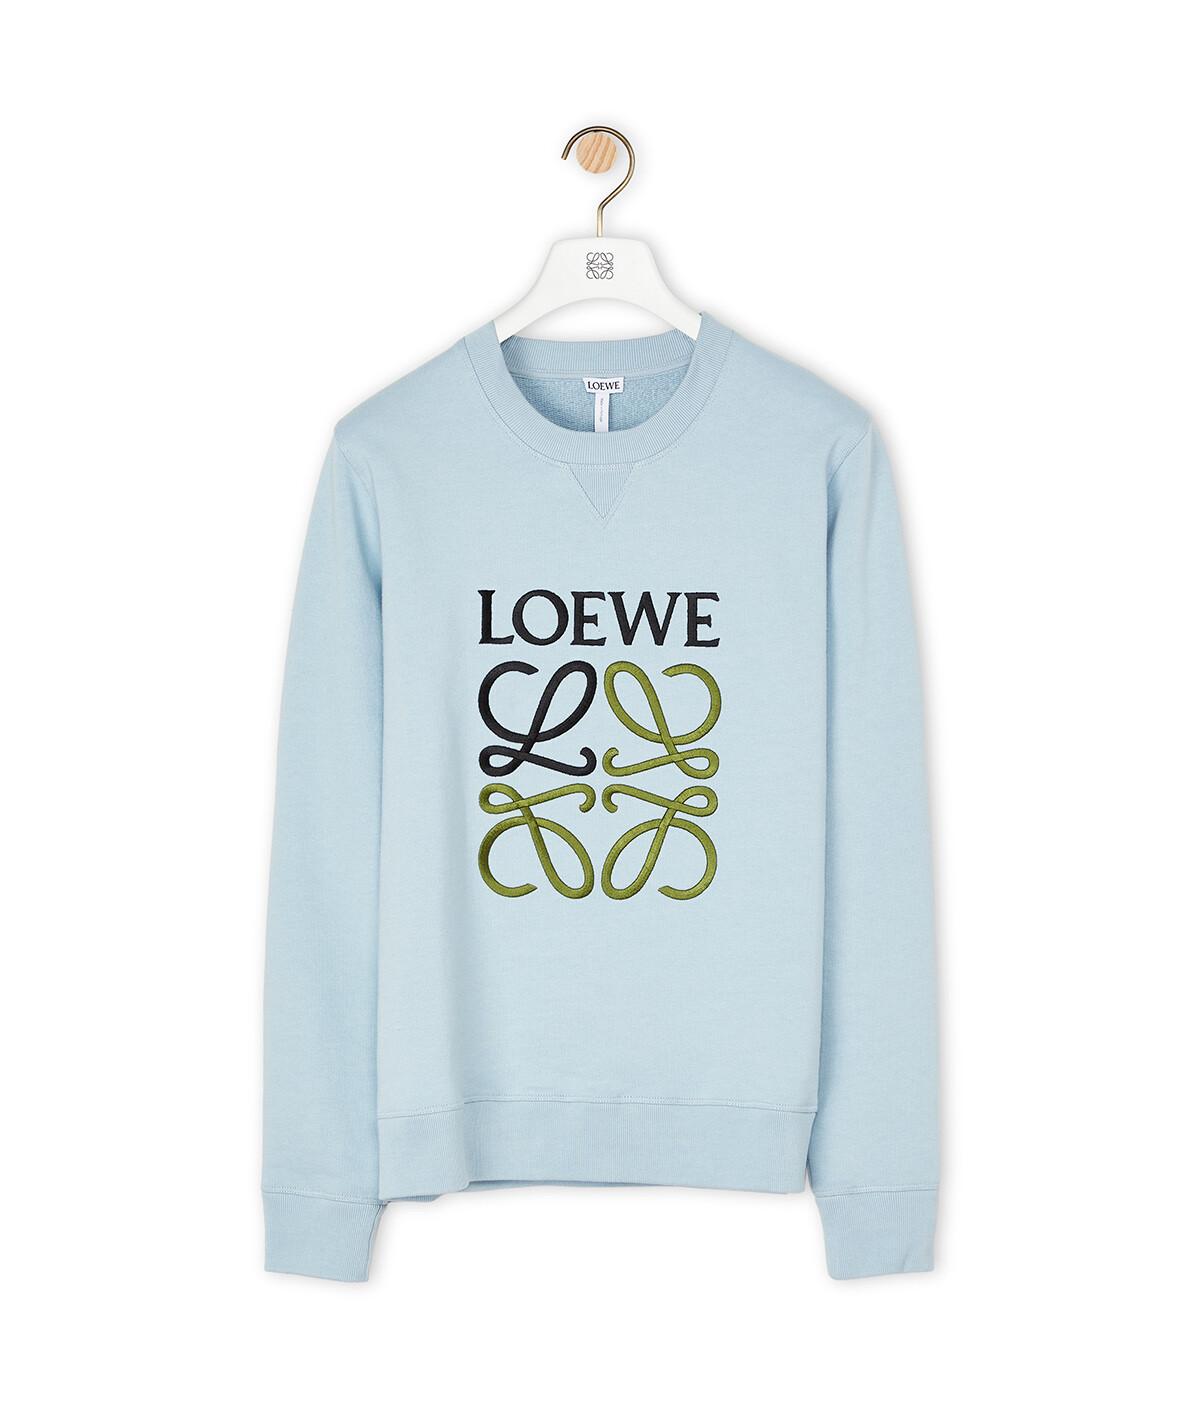 LOEWE Anagram Sweatshirt Baby Blue front